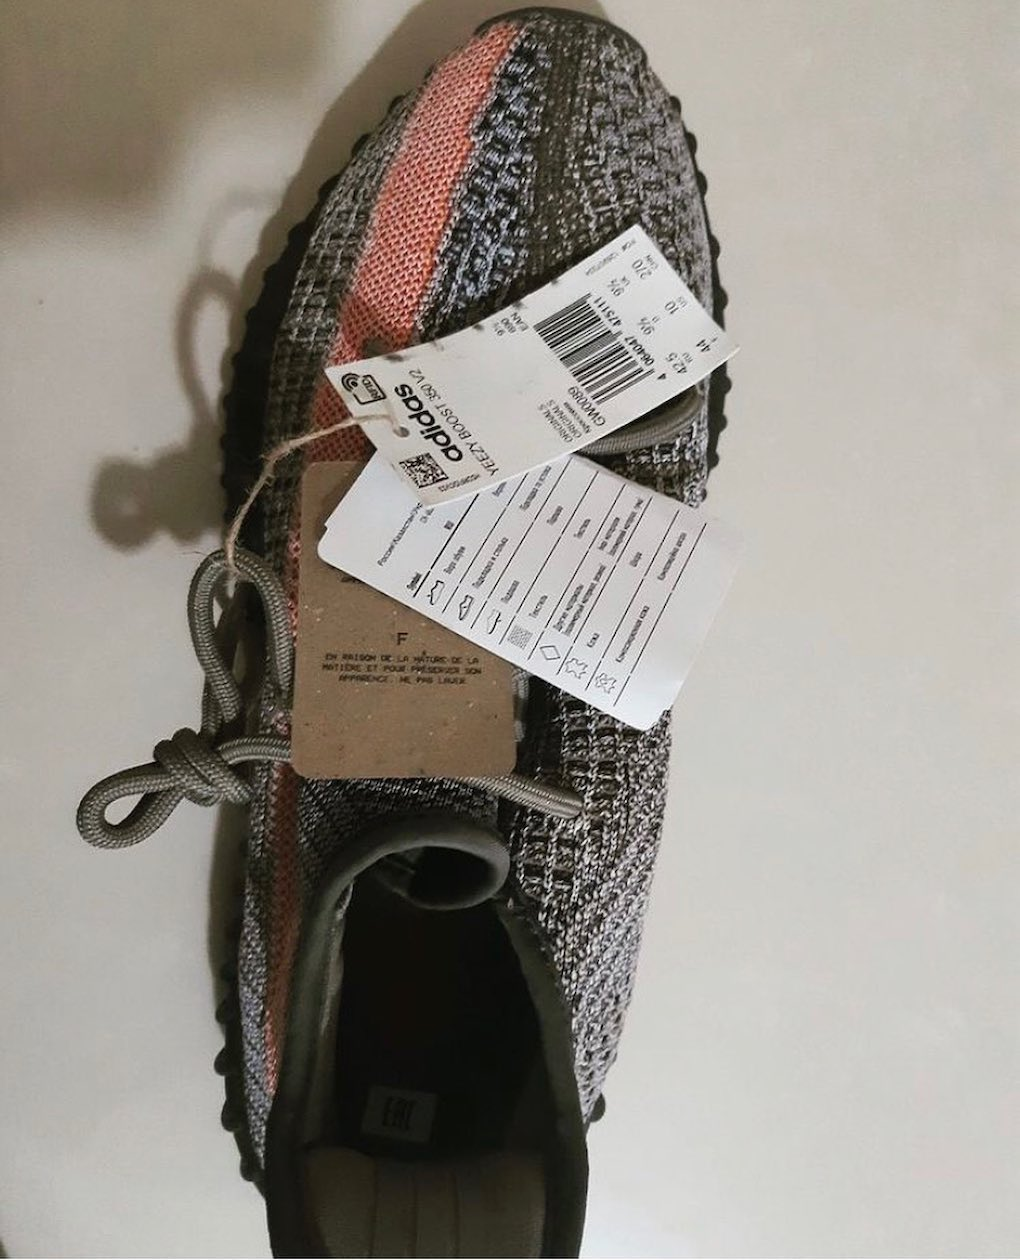 adidas Yeezy Boost 350 V2 Ash Stone adidas Yeezy Boost 350 V2 Ash Stone GW0089 Release Date